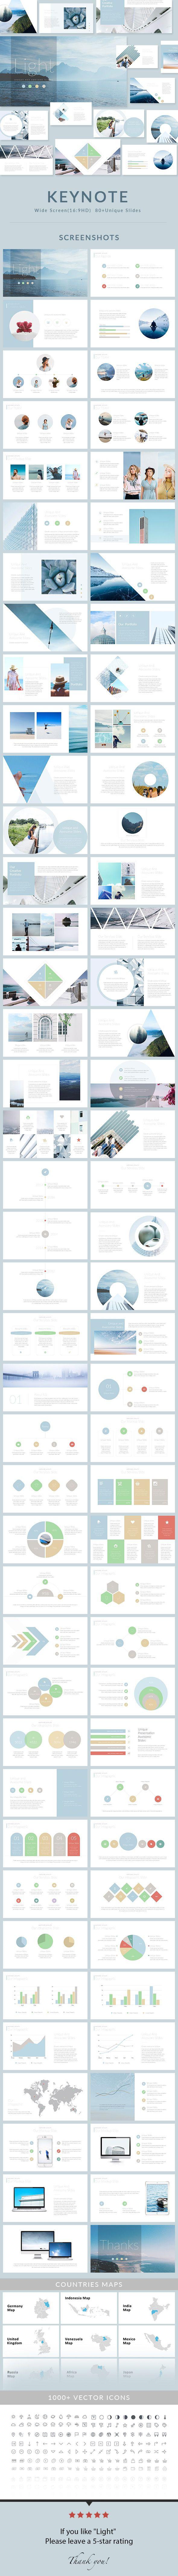 Light - Keynote Presentation Template | Portafolio, Diseño editorial ...